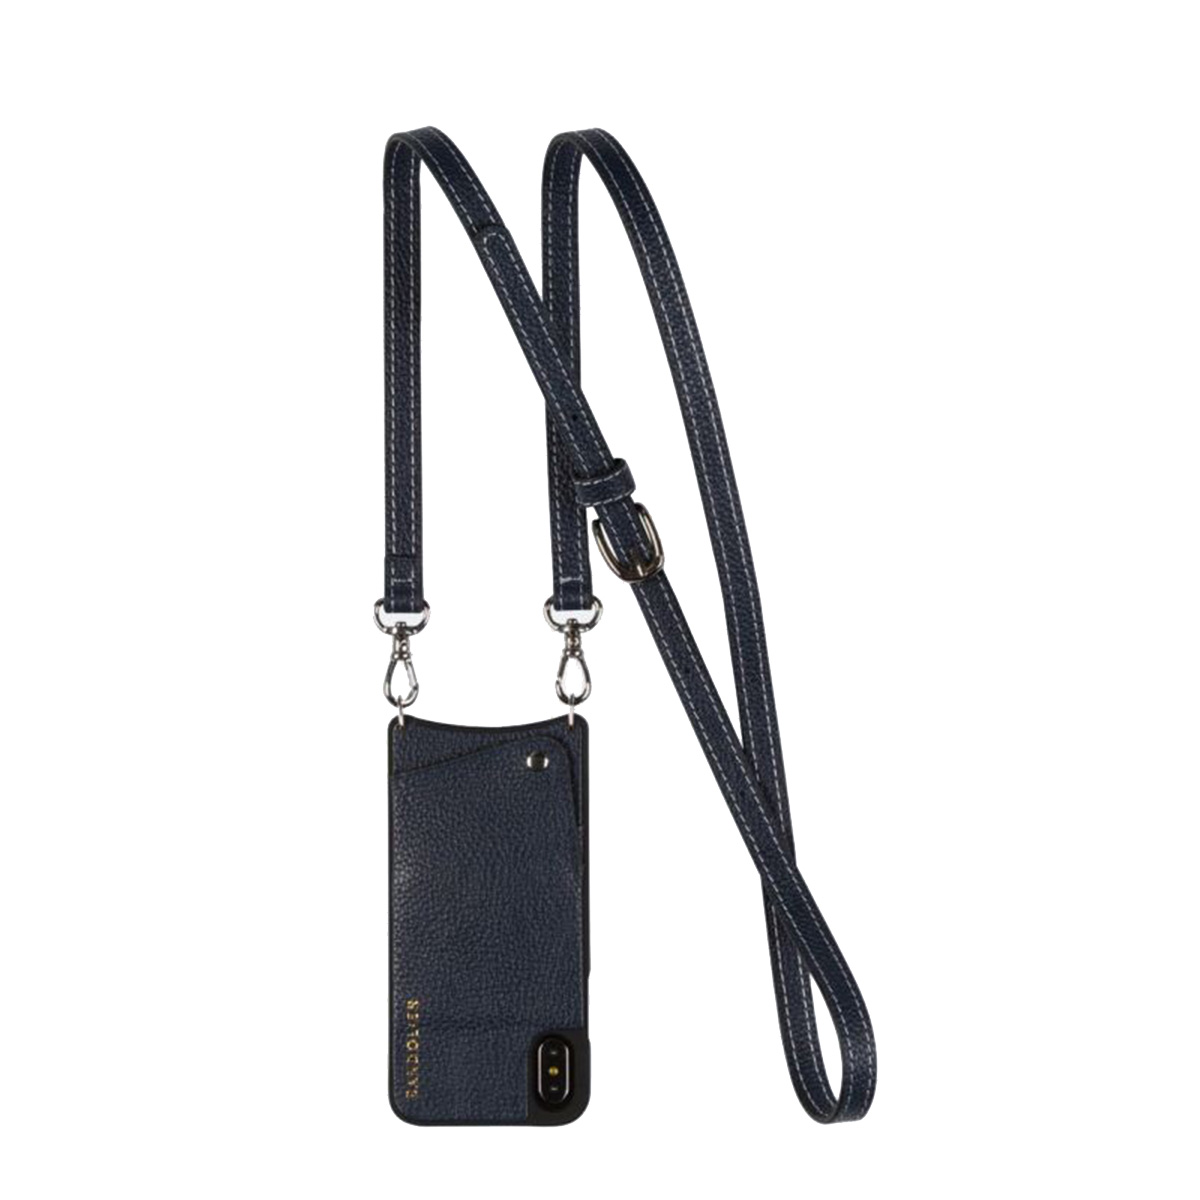 BANDOLIER CASEY NAVY バンドリヤー iPhone XR ケース スマホ 携帯 レディース ネイビー 10cas